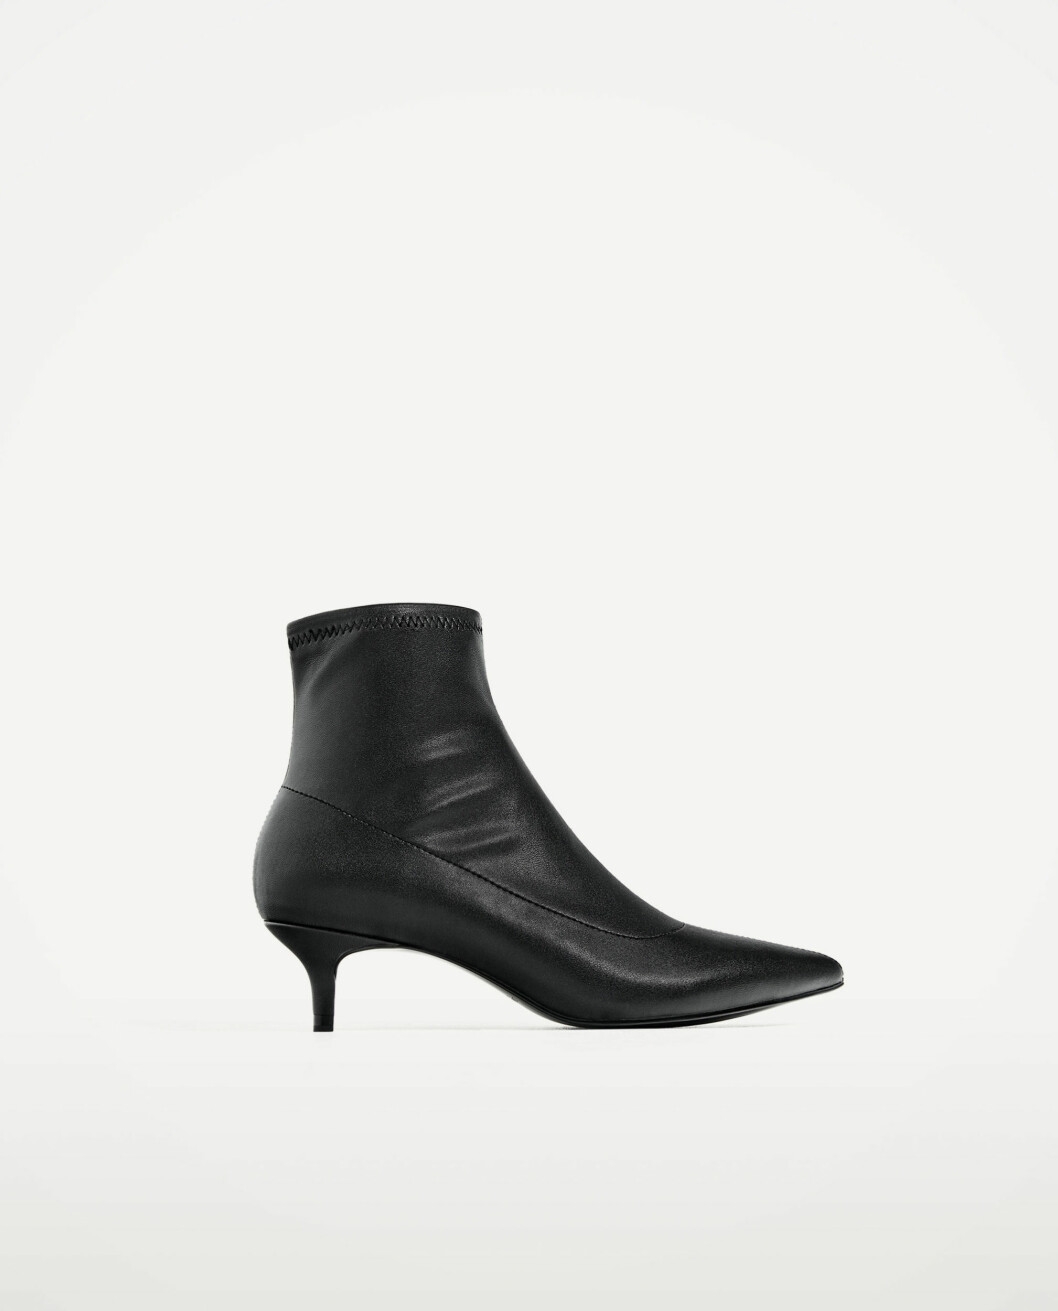 <strong>Sko fra Zara | kr 399 | http:</strong>//www.zara.com/no/no/dame/sko/se-alle/elastisk-skolett-med-middels-h%C3%B8y-h%C3%A6l-c719531p4065666.html